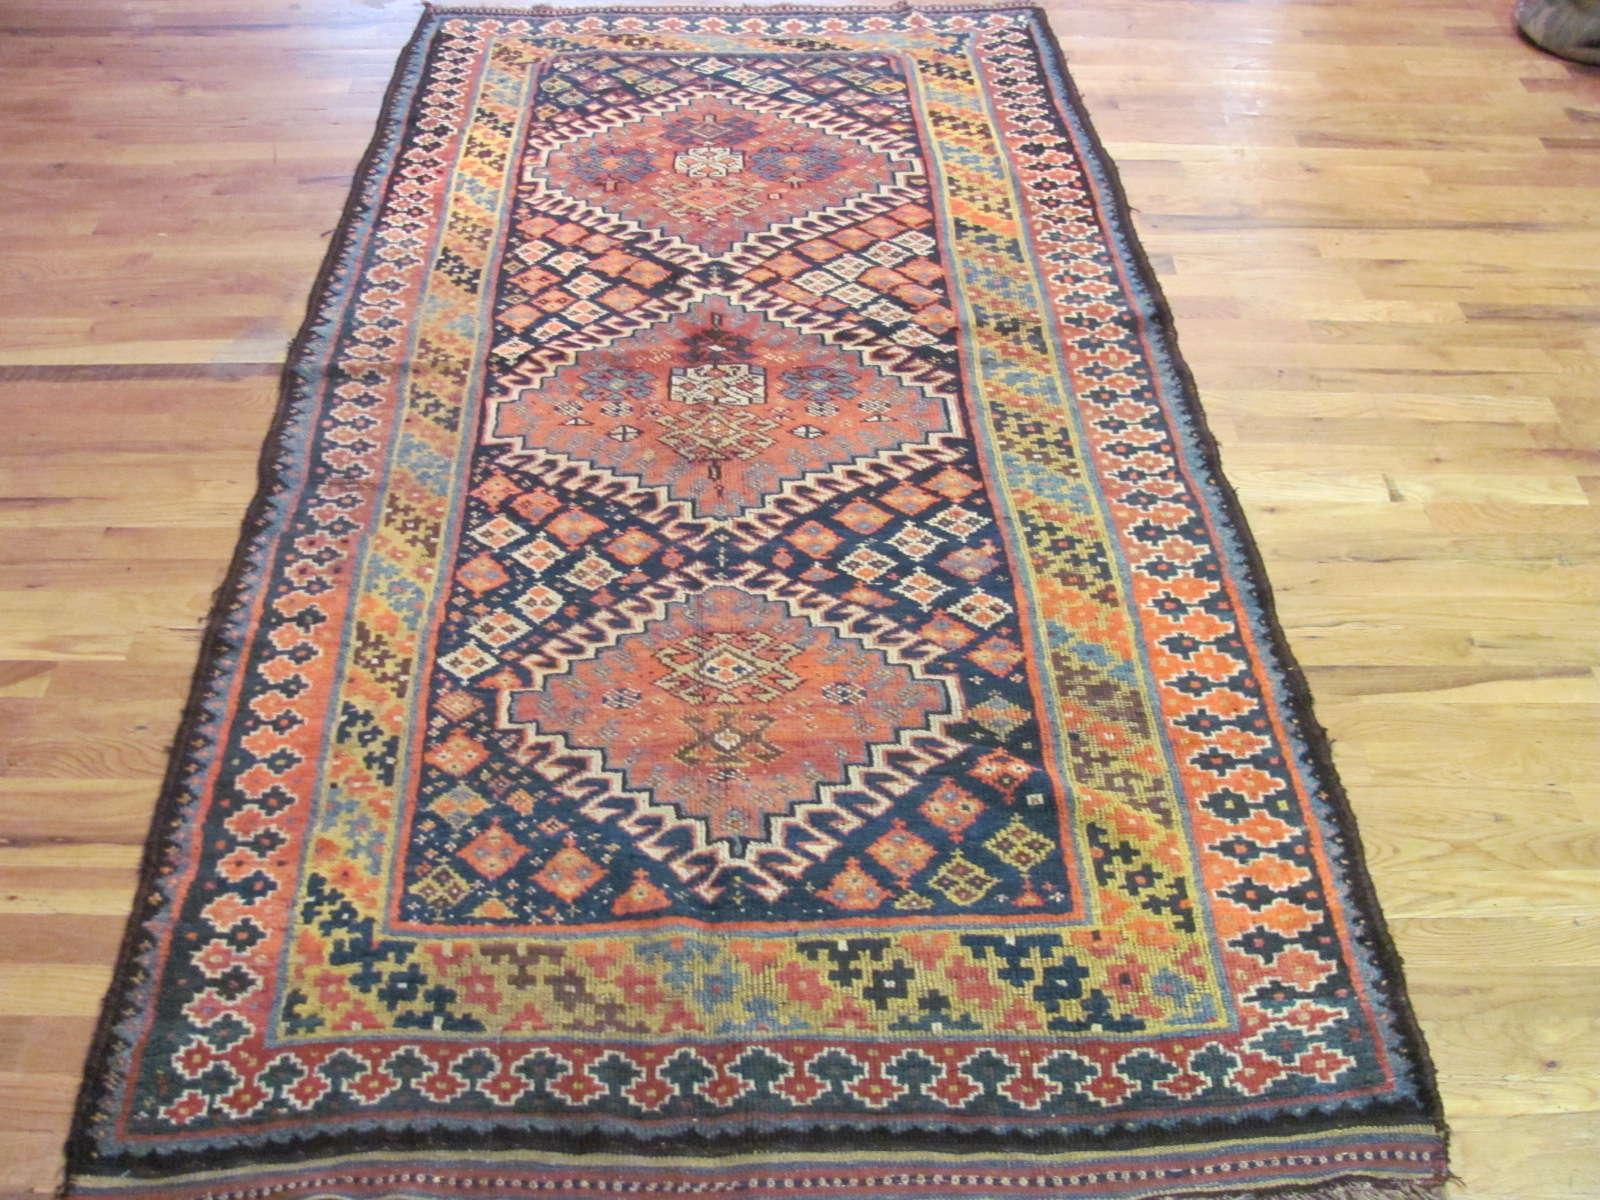 Kurd Rug | Northwest Persia | Handmade | Antique Circa 1910